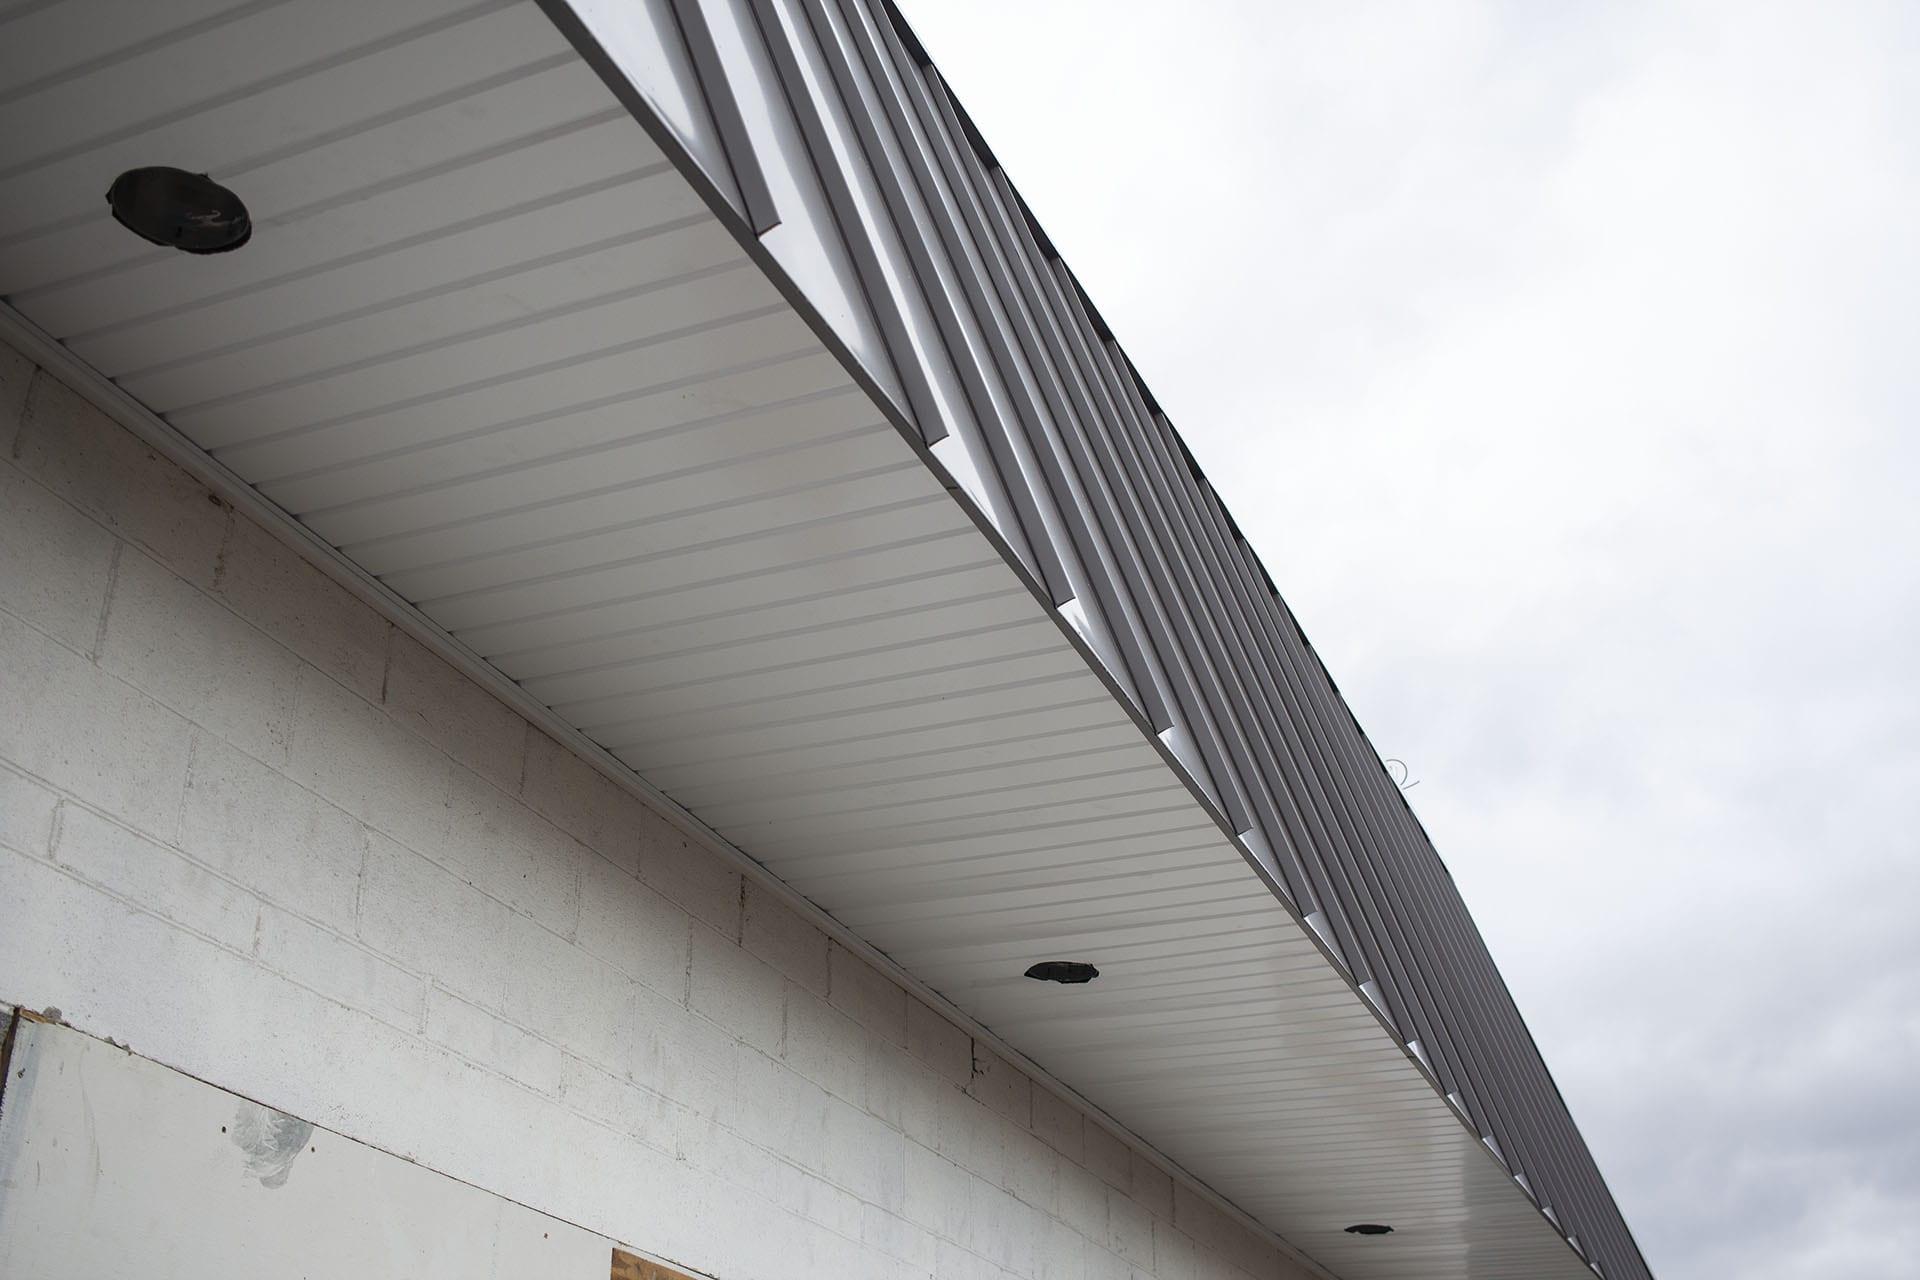 IMG_7518-roof-soffet-web-d&s-flooring-min.jpg